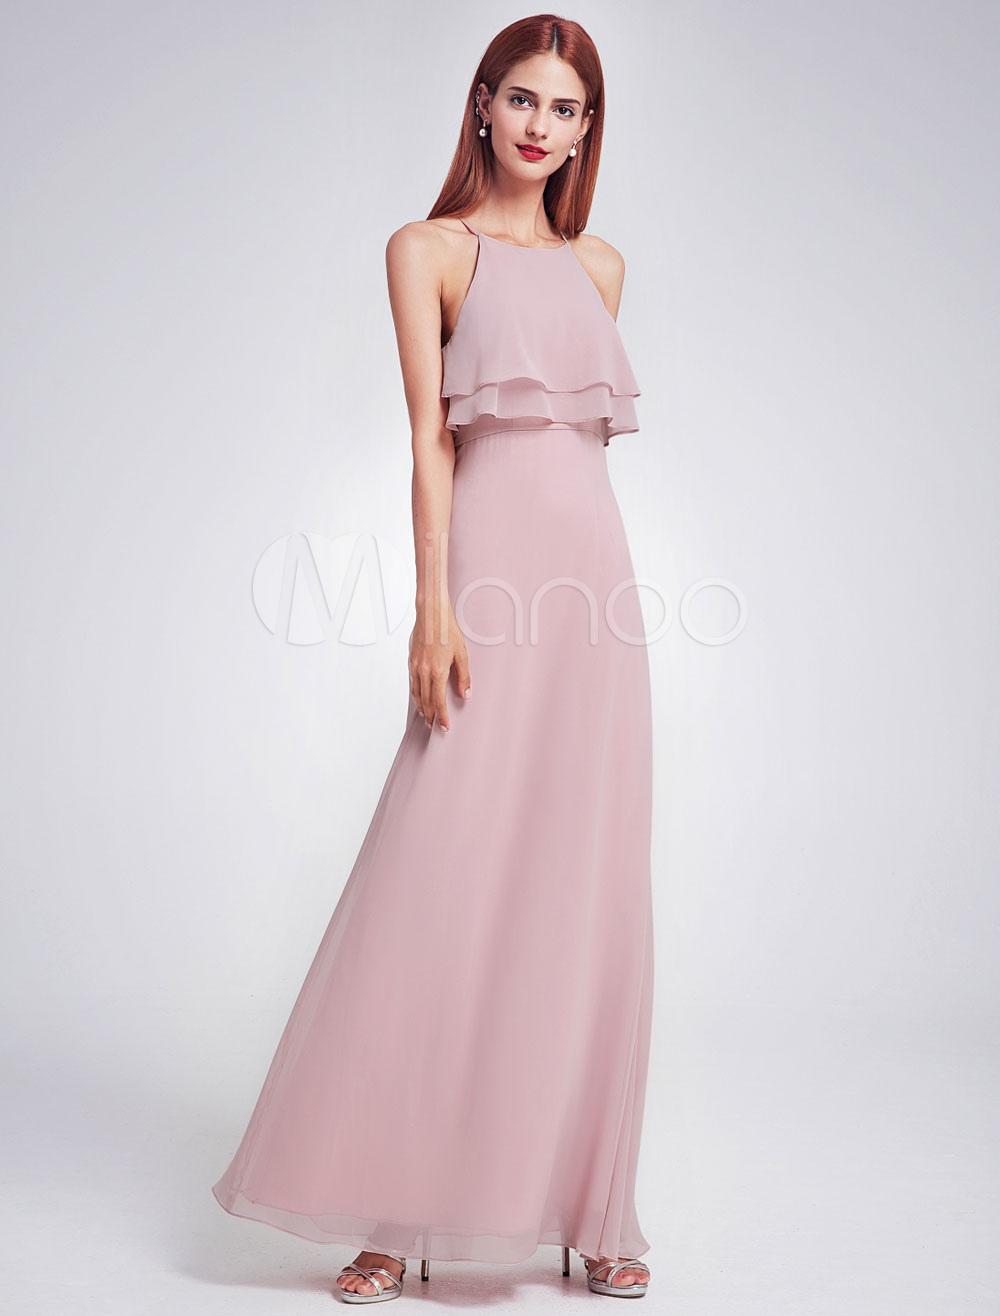 Chiffon Bridesmaid Dress Long Halter Sleeveless Layered Prom Dresses Cameo Pink A Line Floor Length Party Dresses (Wedding) photo